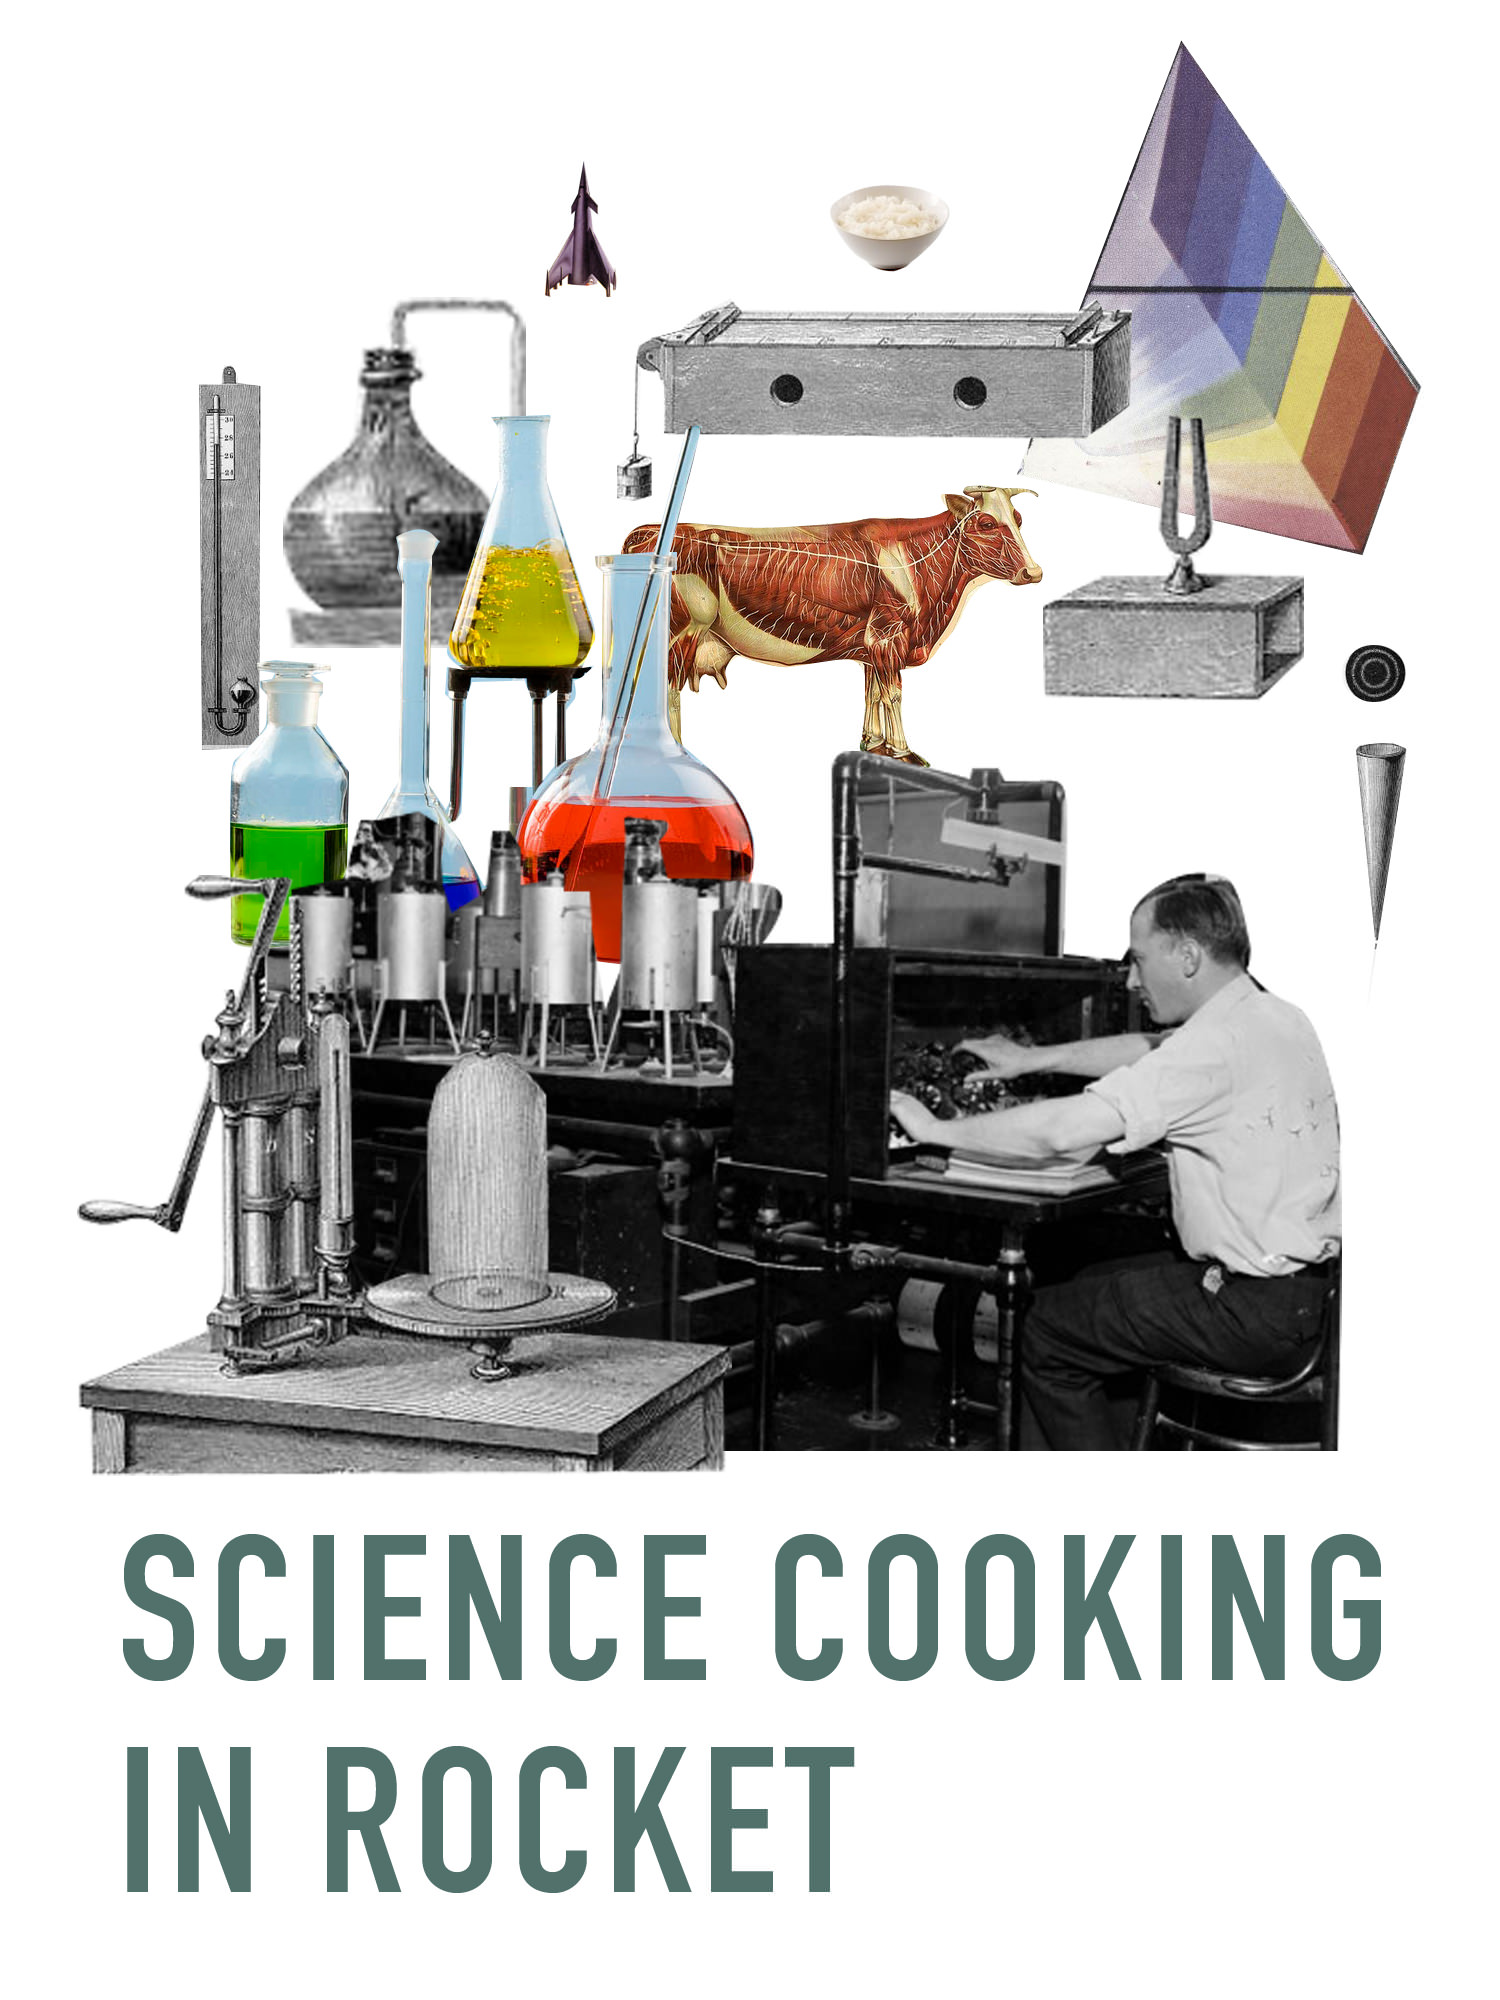 sciencecooking_image